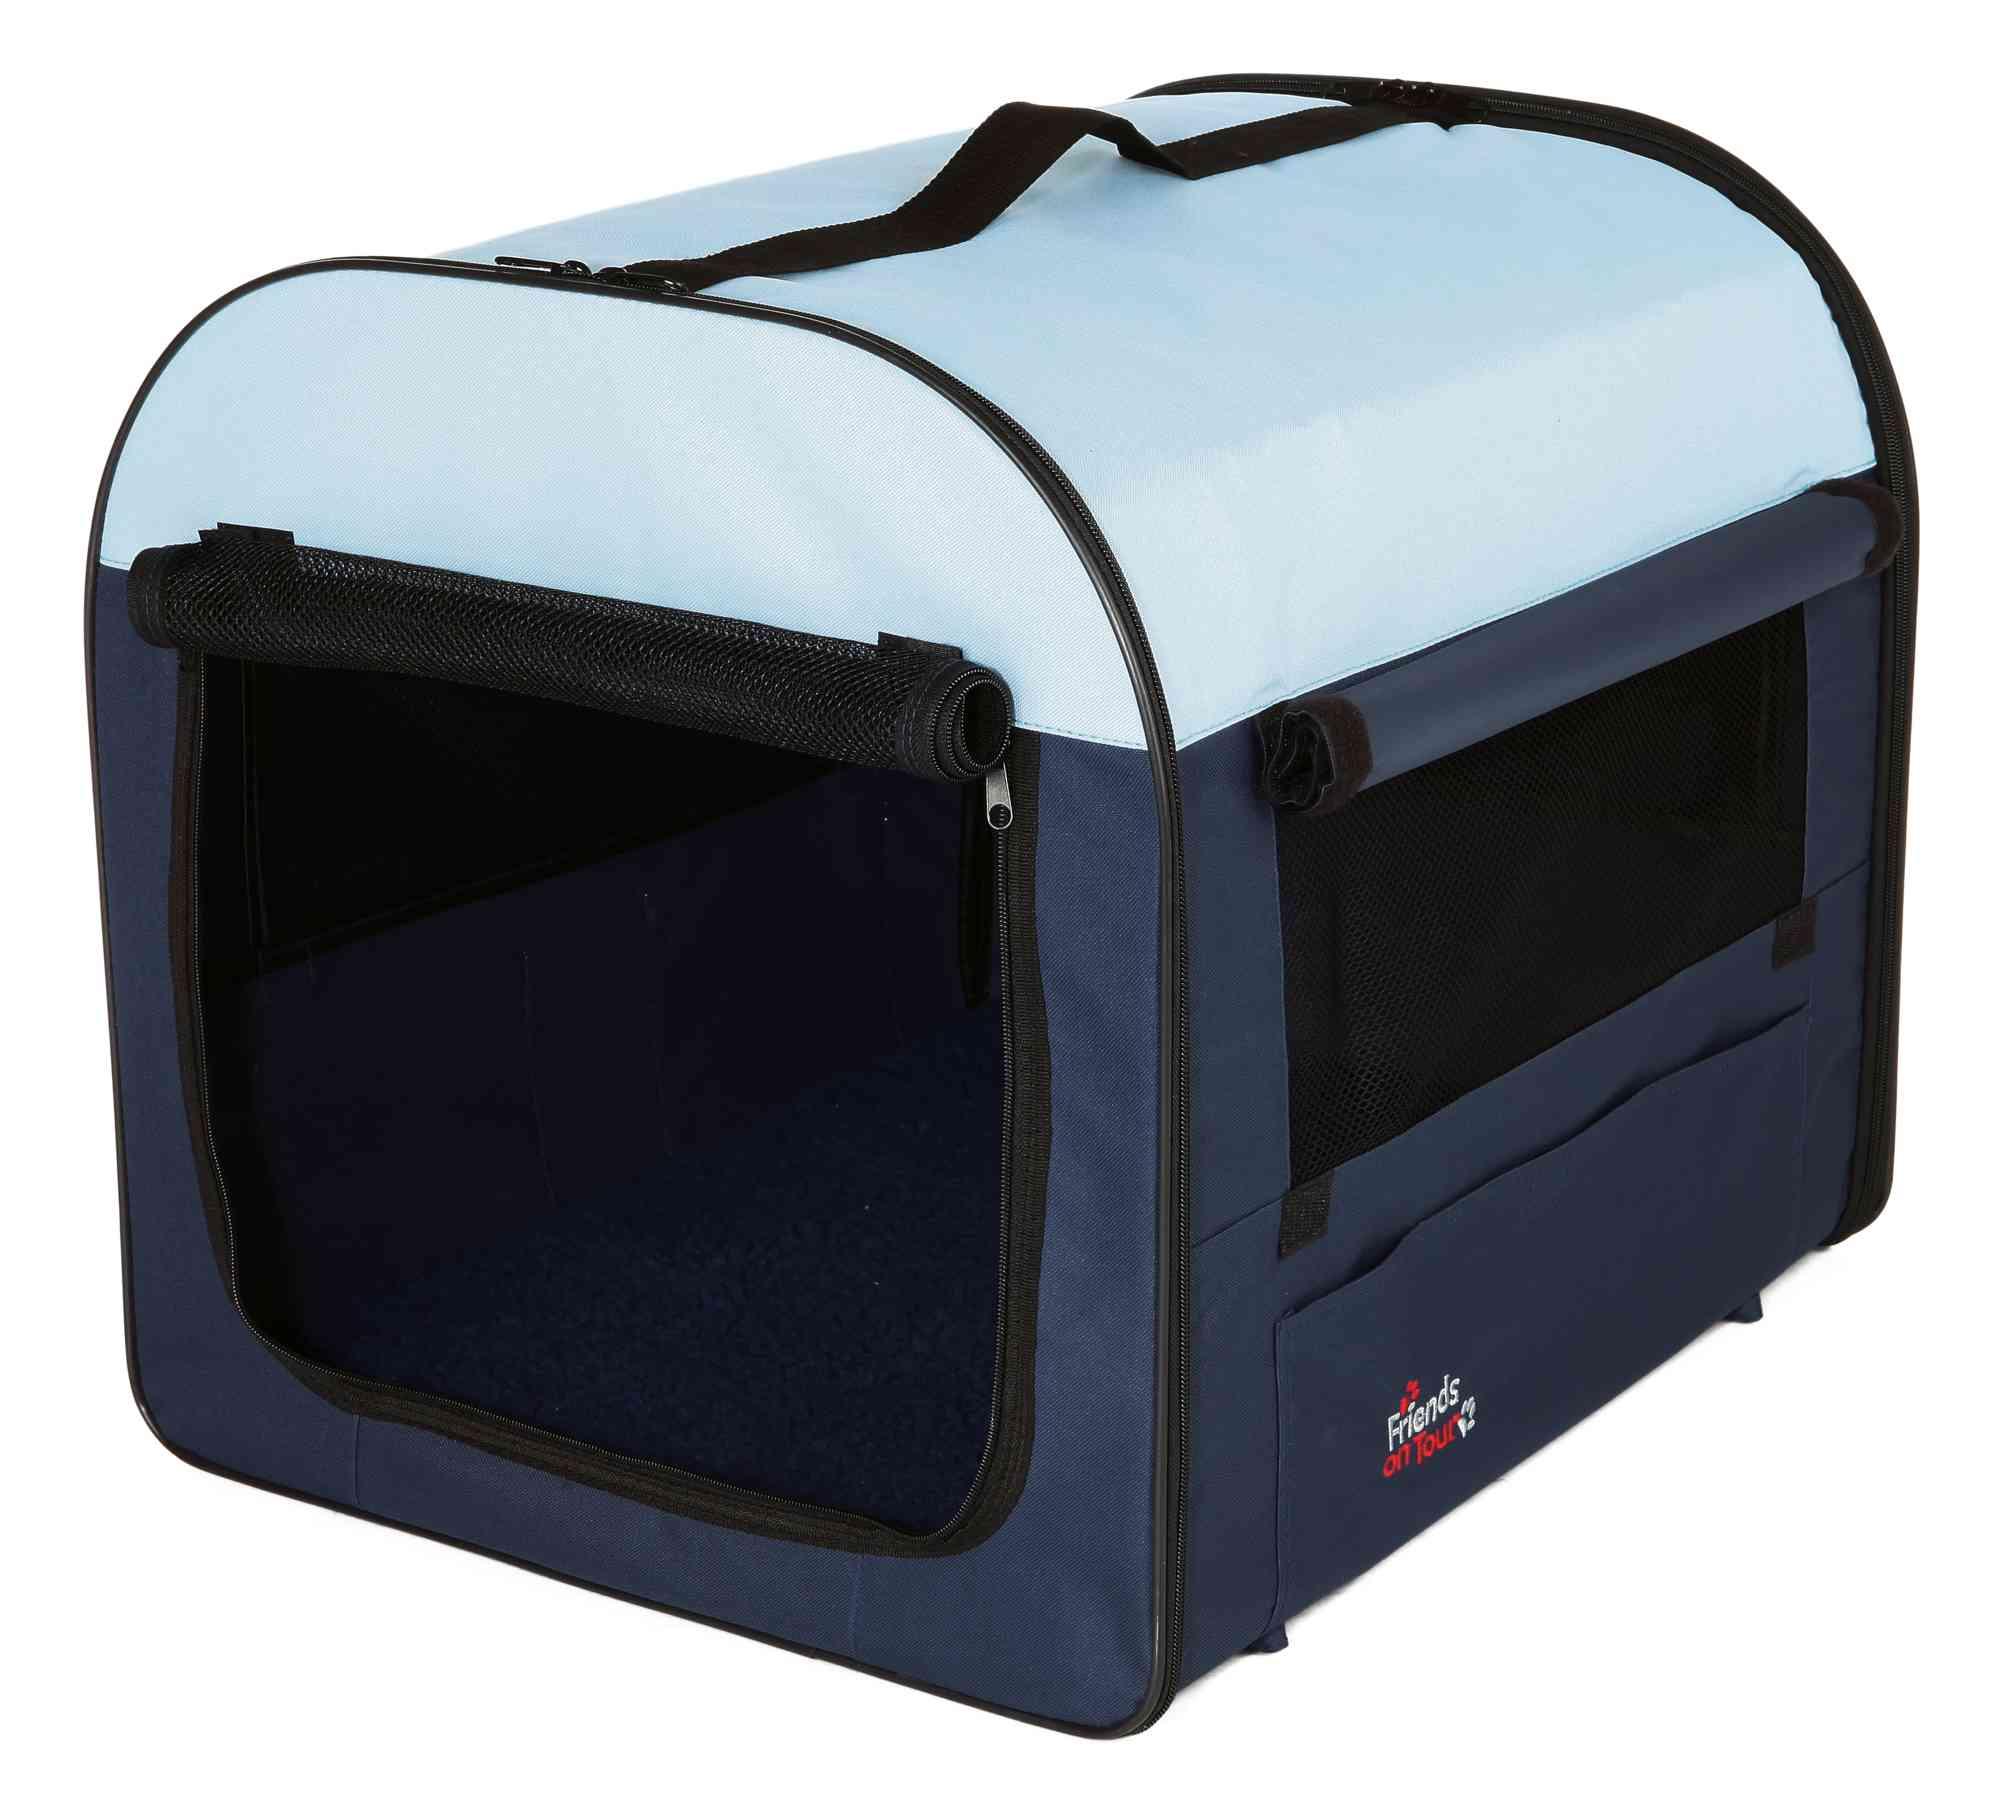 TRIXIE Mobile Kennel, dunkelblau/hellblau TRIXIE Mobile Kennel, XS–S: 40 × 40 × 55 cm, dunkelblau/hellblau